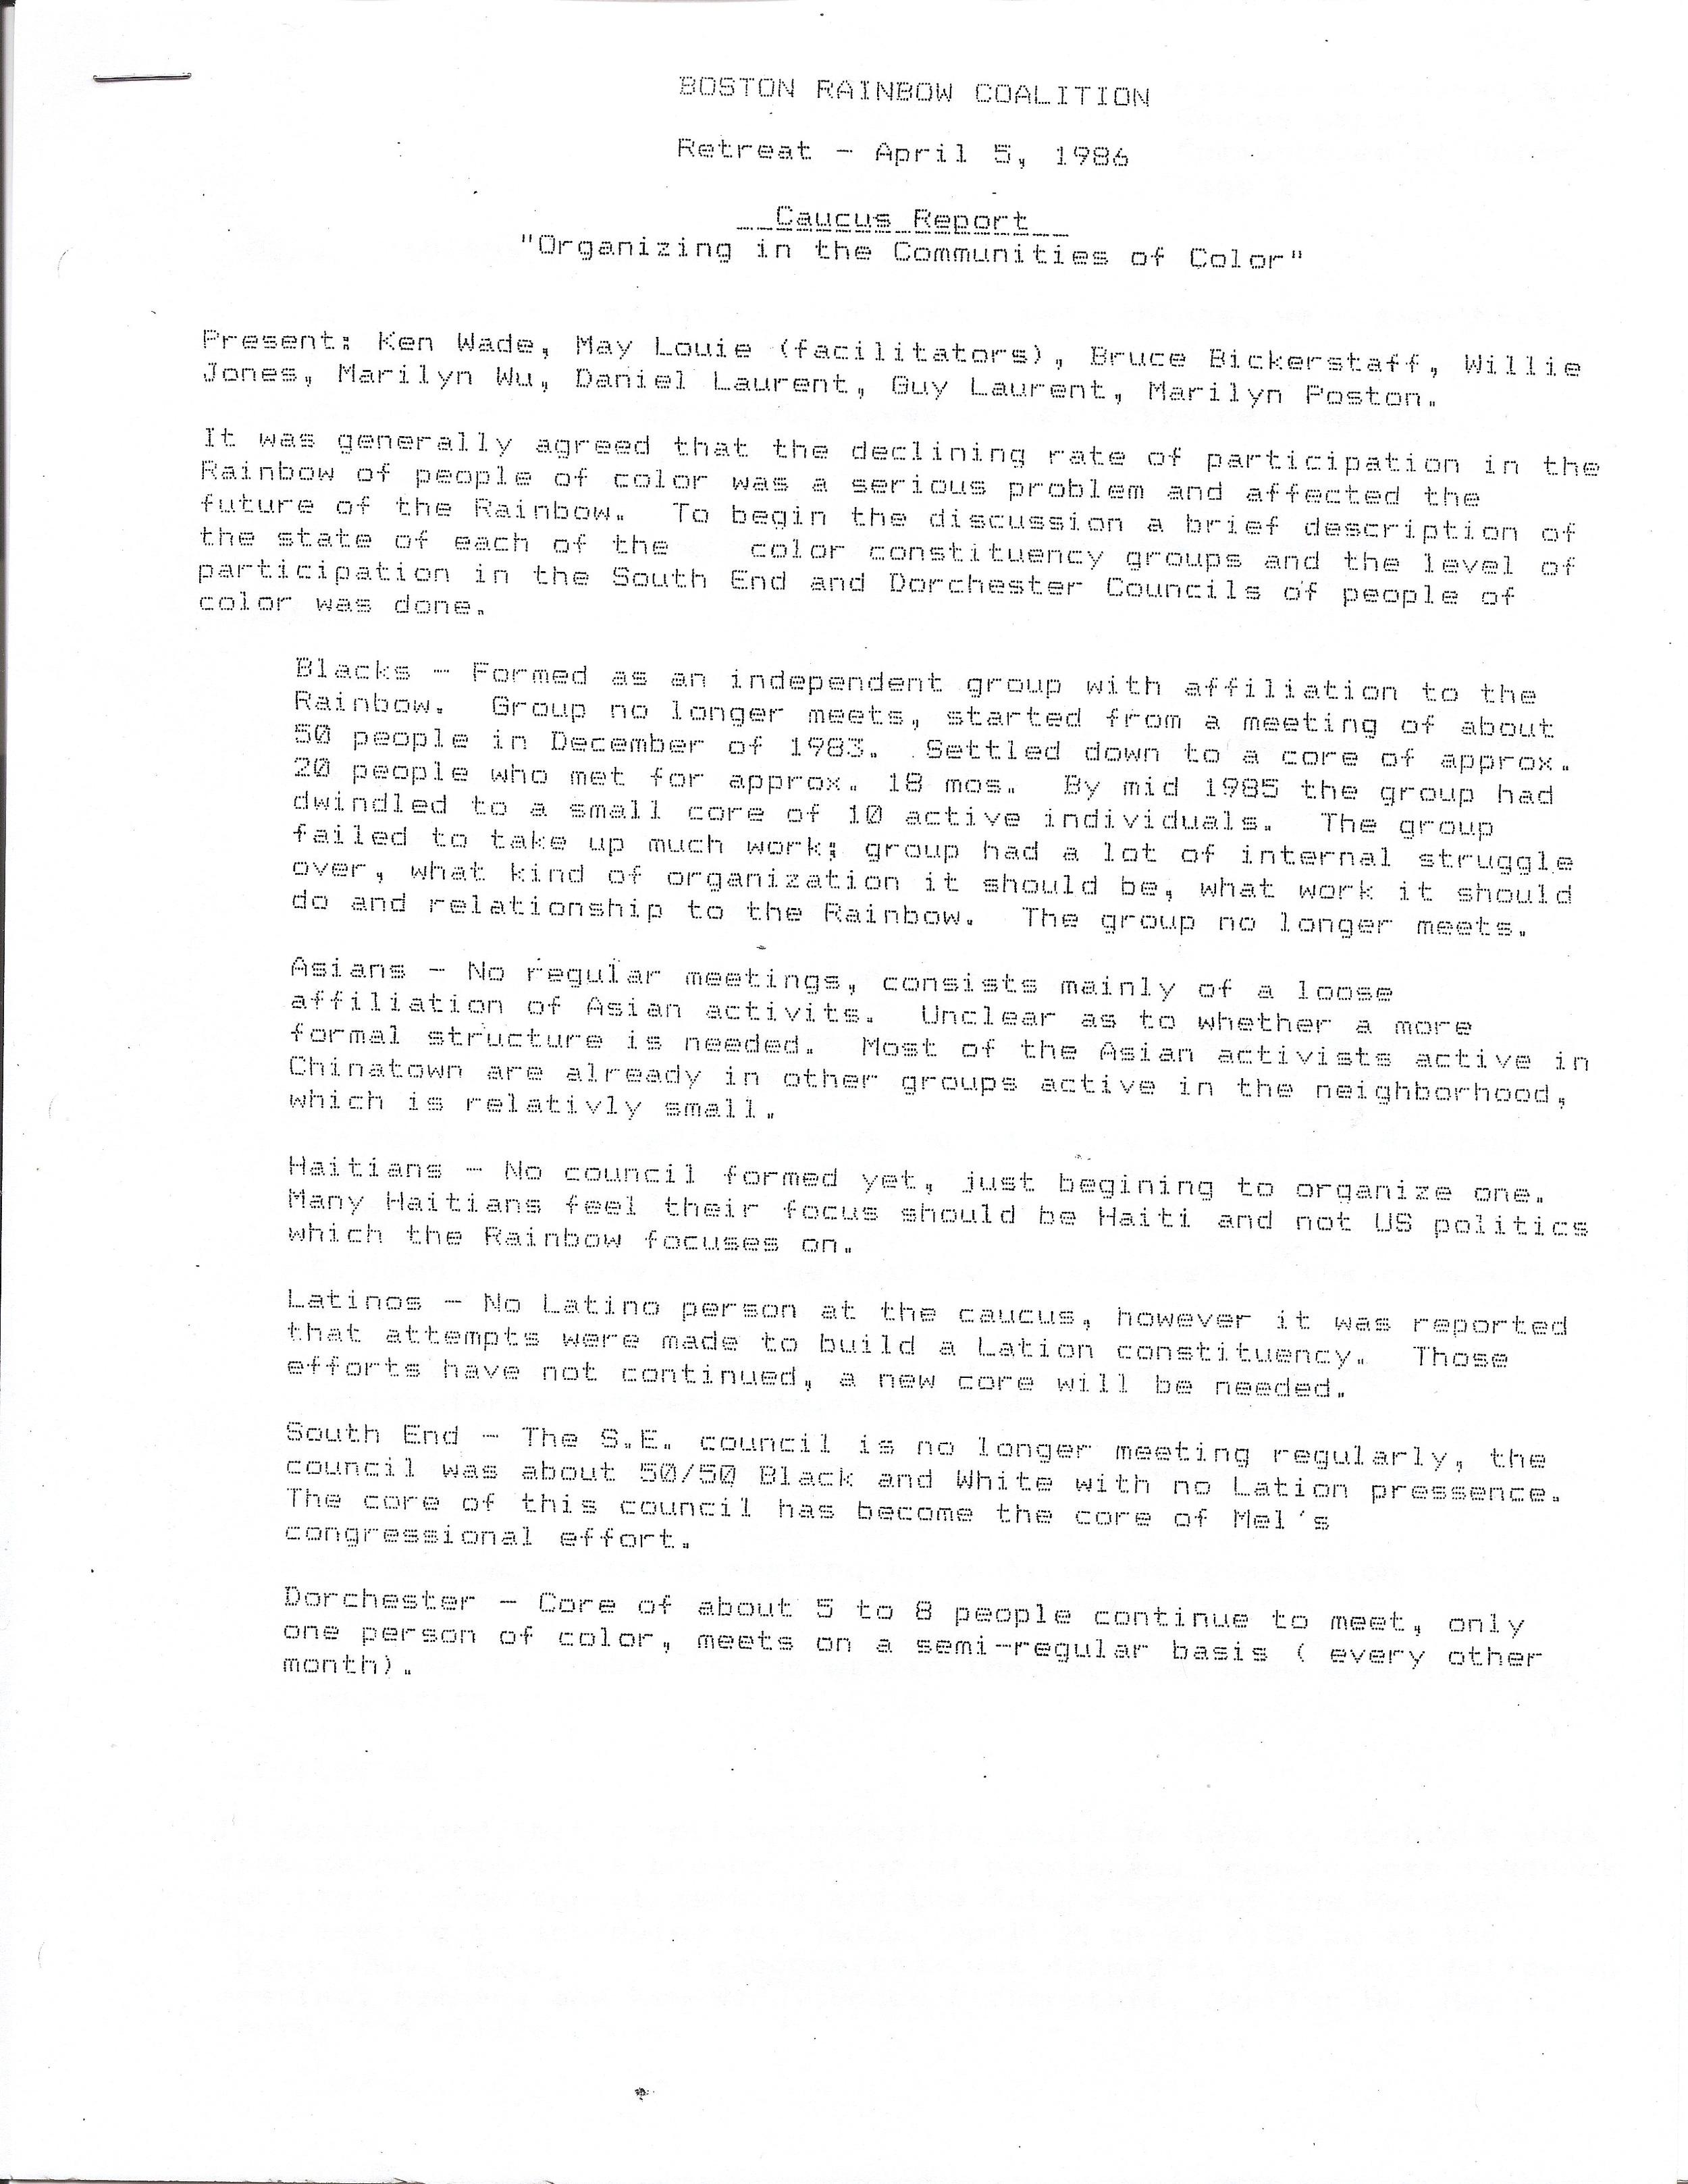 Rainbow Coalition, Mel King Papers, Roxbury Community College.